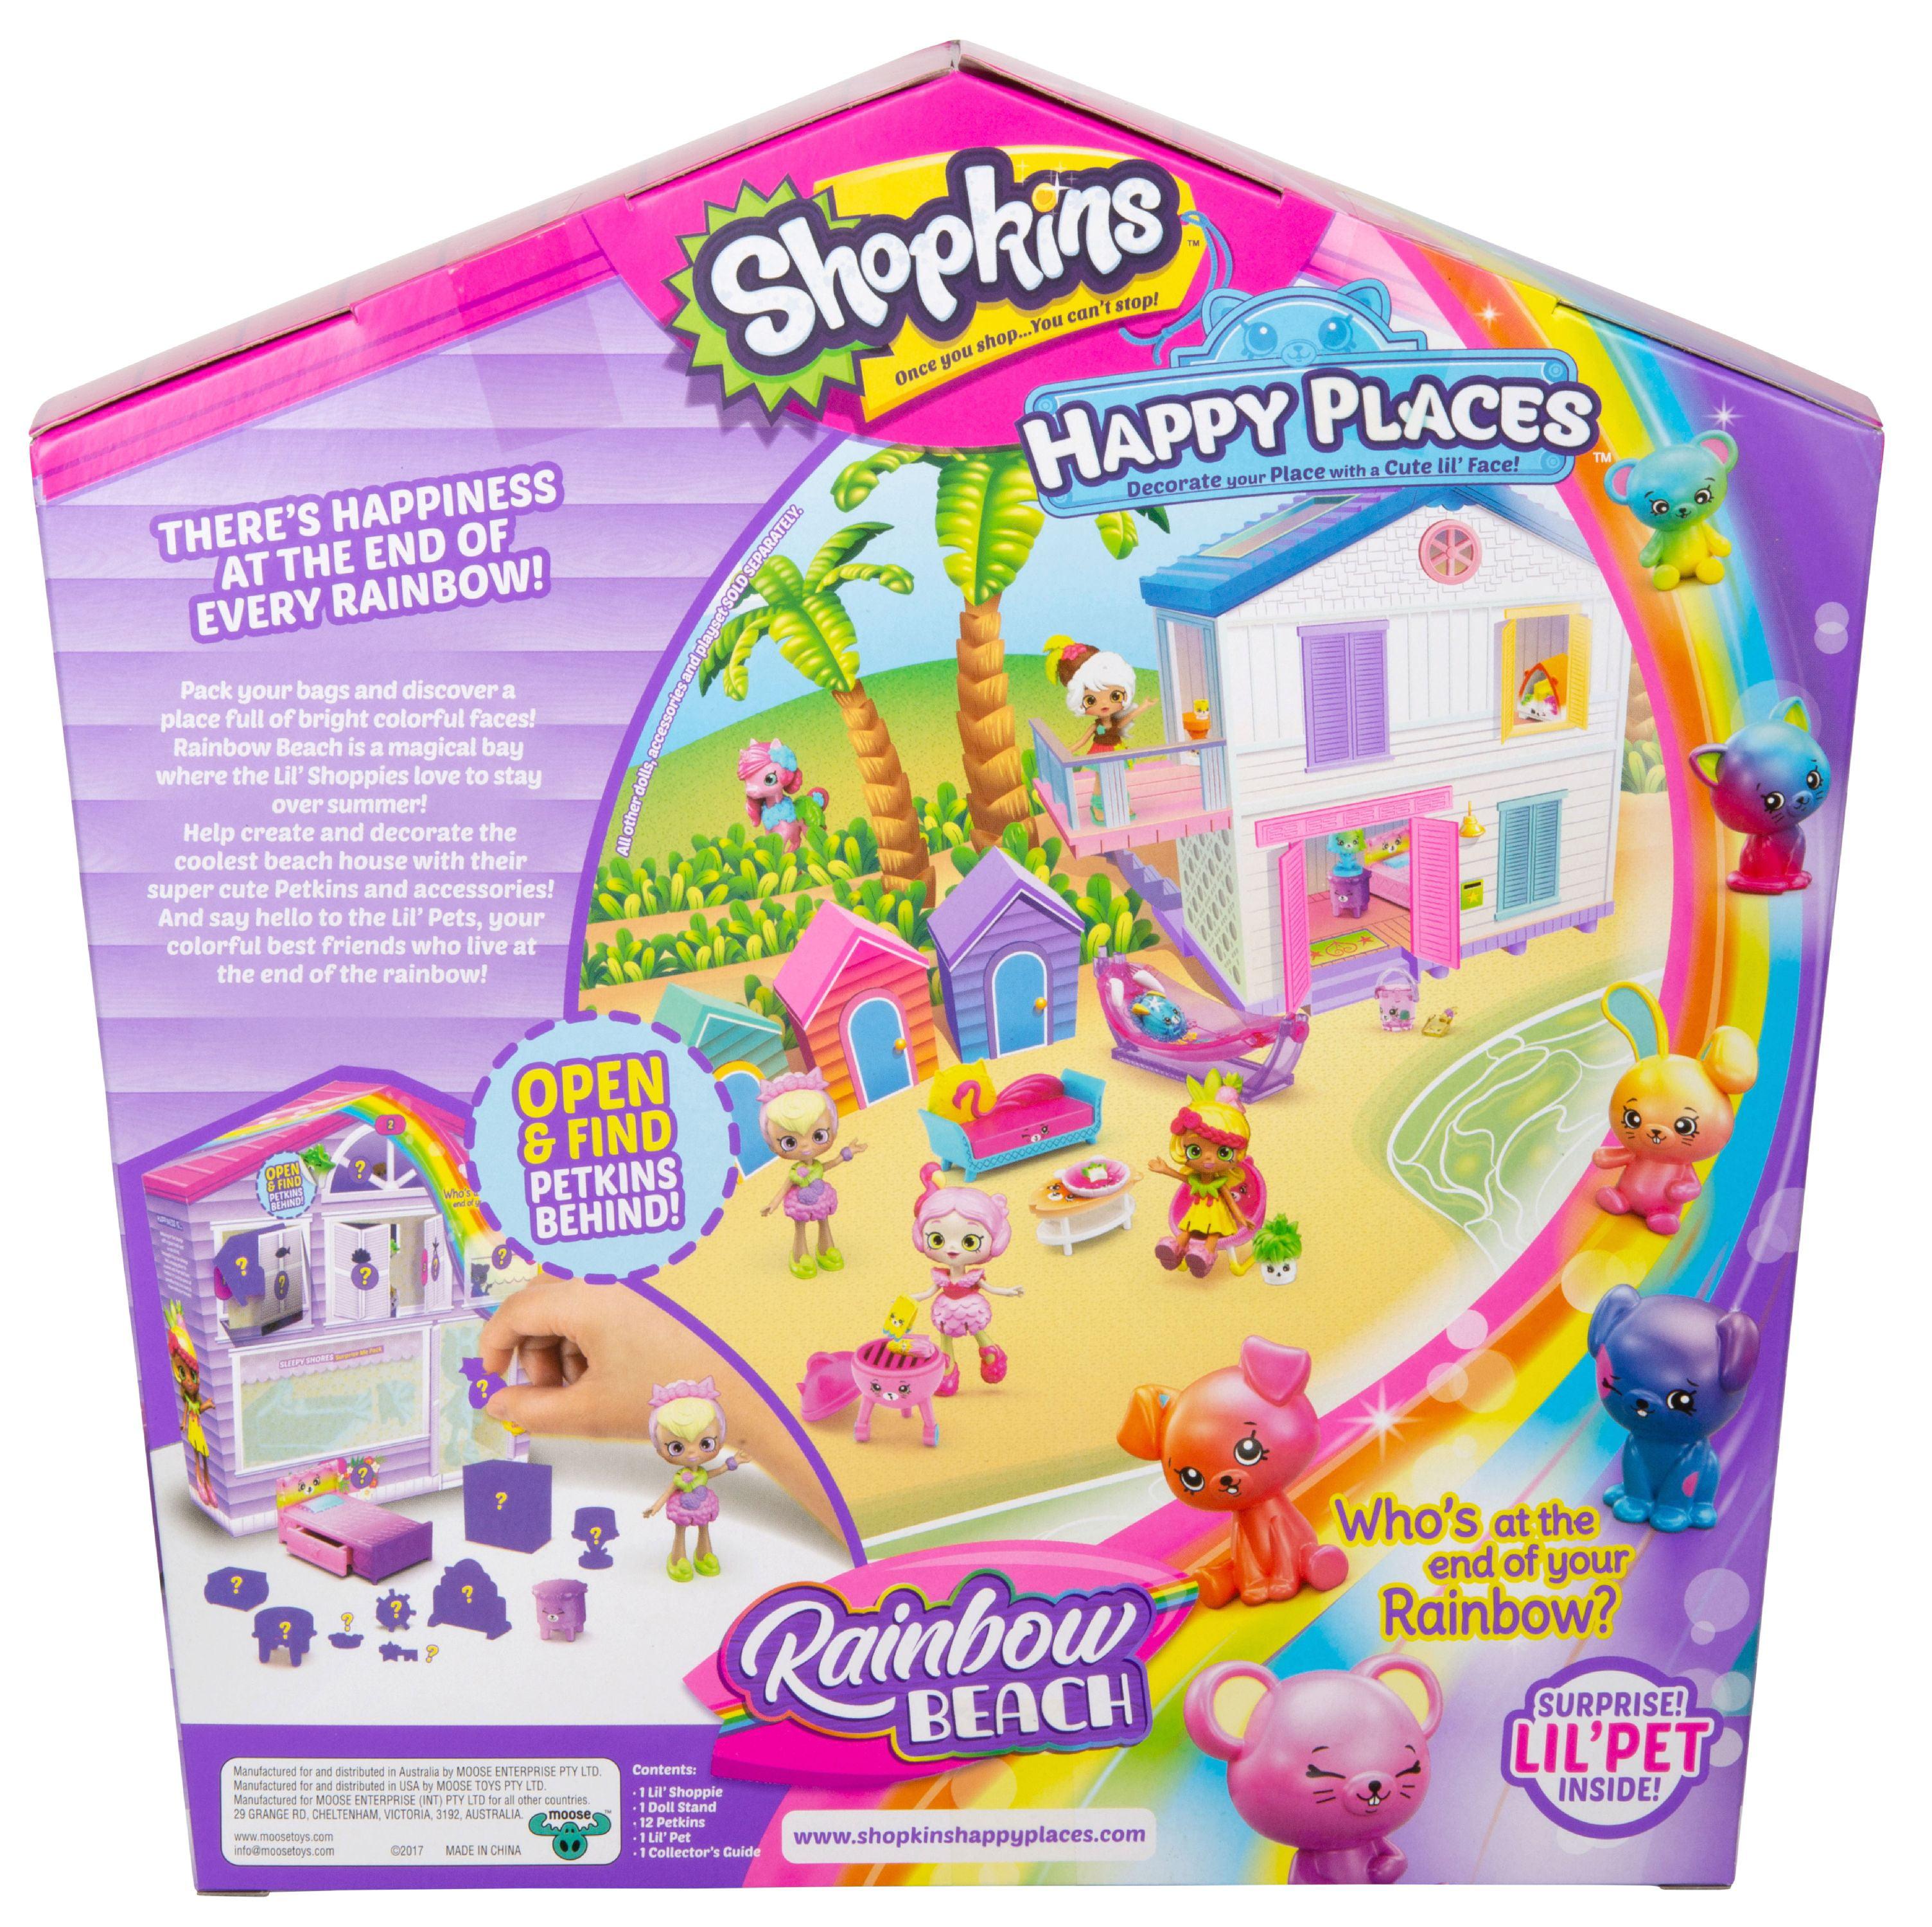 Shopkins Happy Places Rainbow Beach Furniture Set, Sleepy Shores